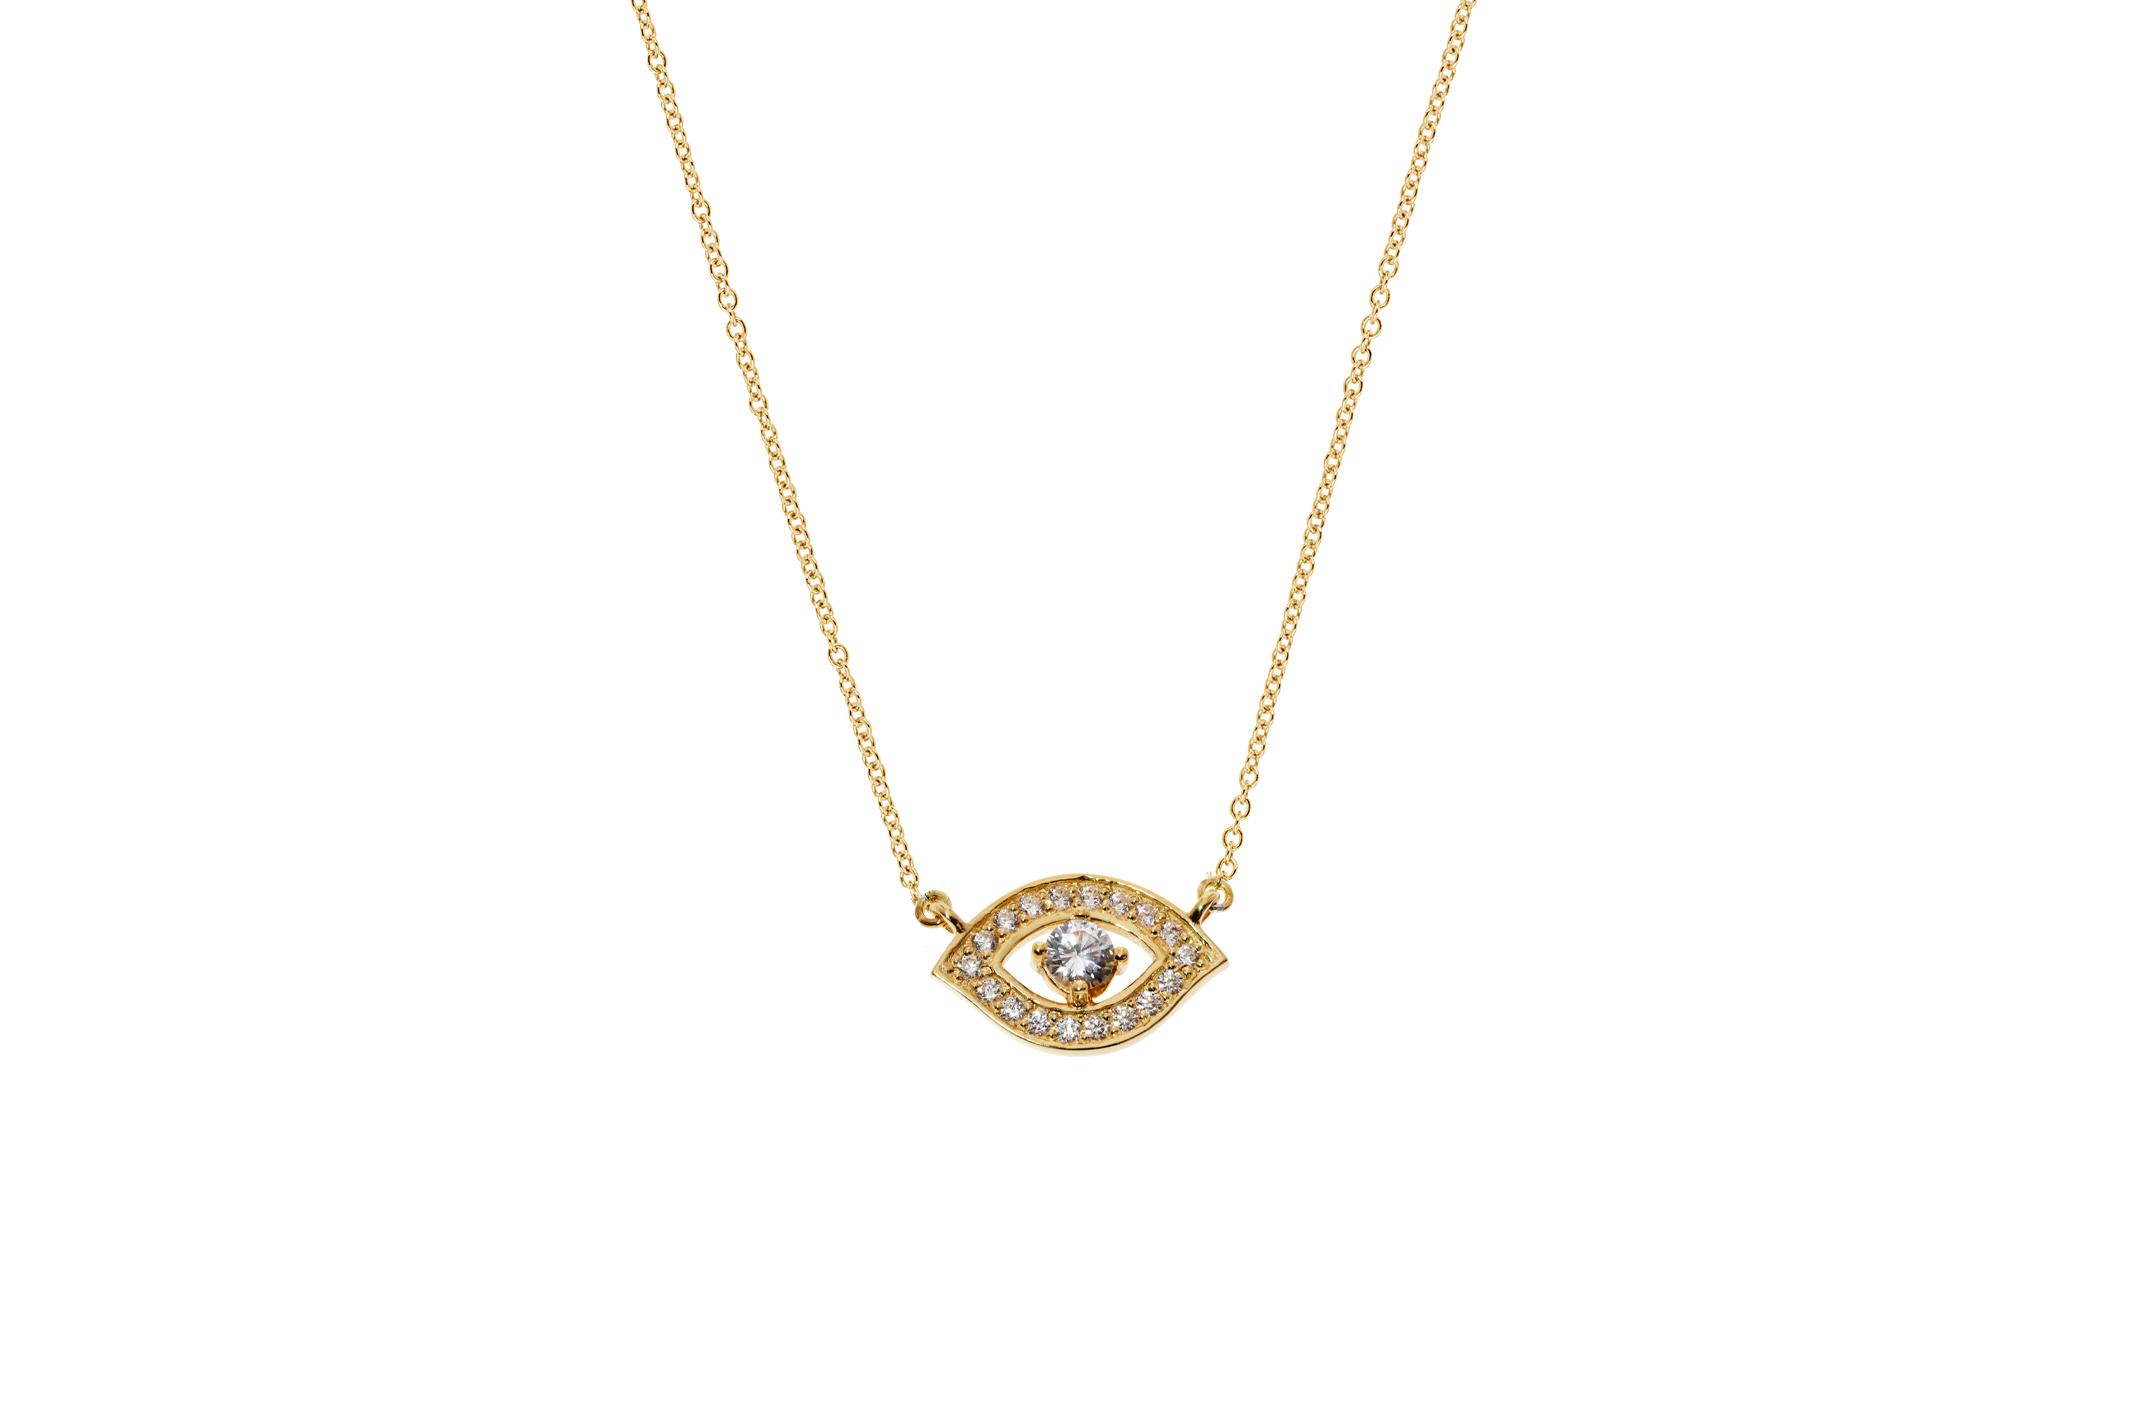 Joia: colar;Material: prata 925;Peso: 3.0 gr;Pedras: zircónias;Cor: amarelo;Medida (Fio): 40 + 3 cm;Medida (Pendente): 1 cm;Género: mulher